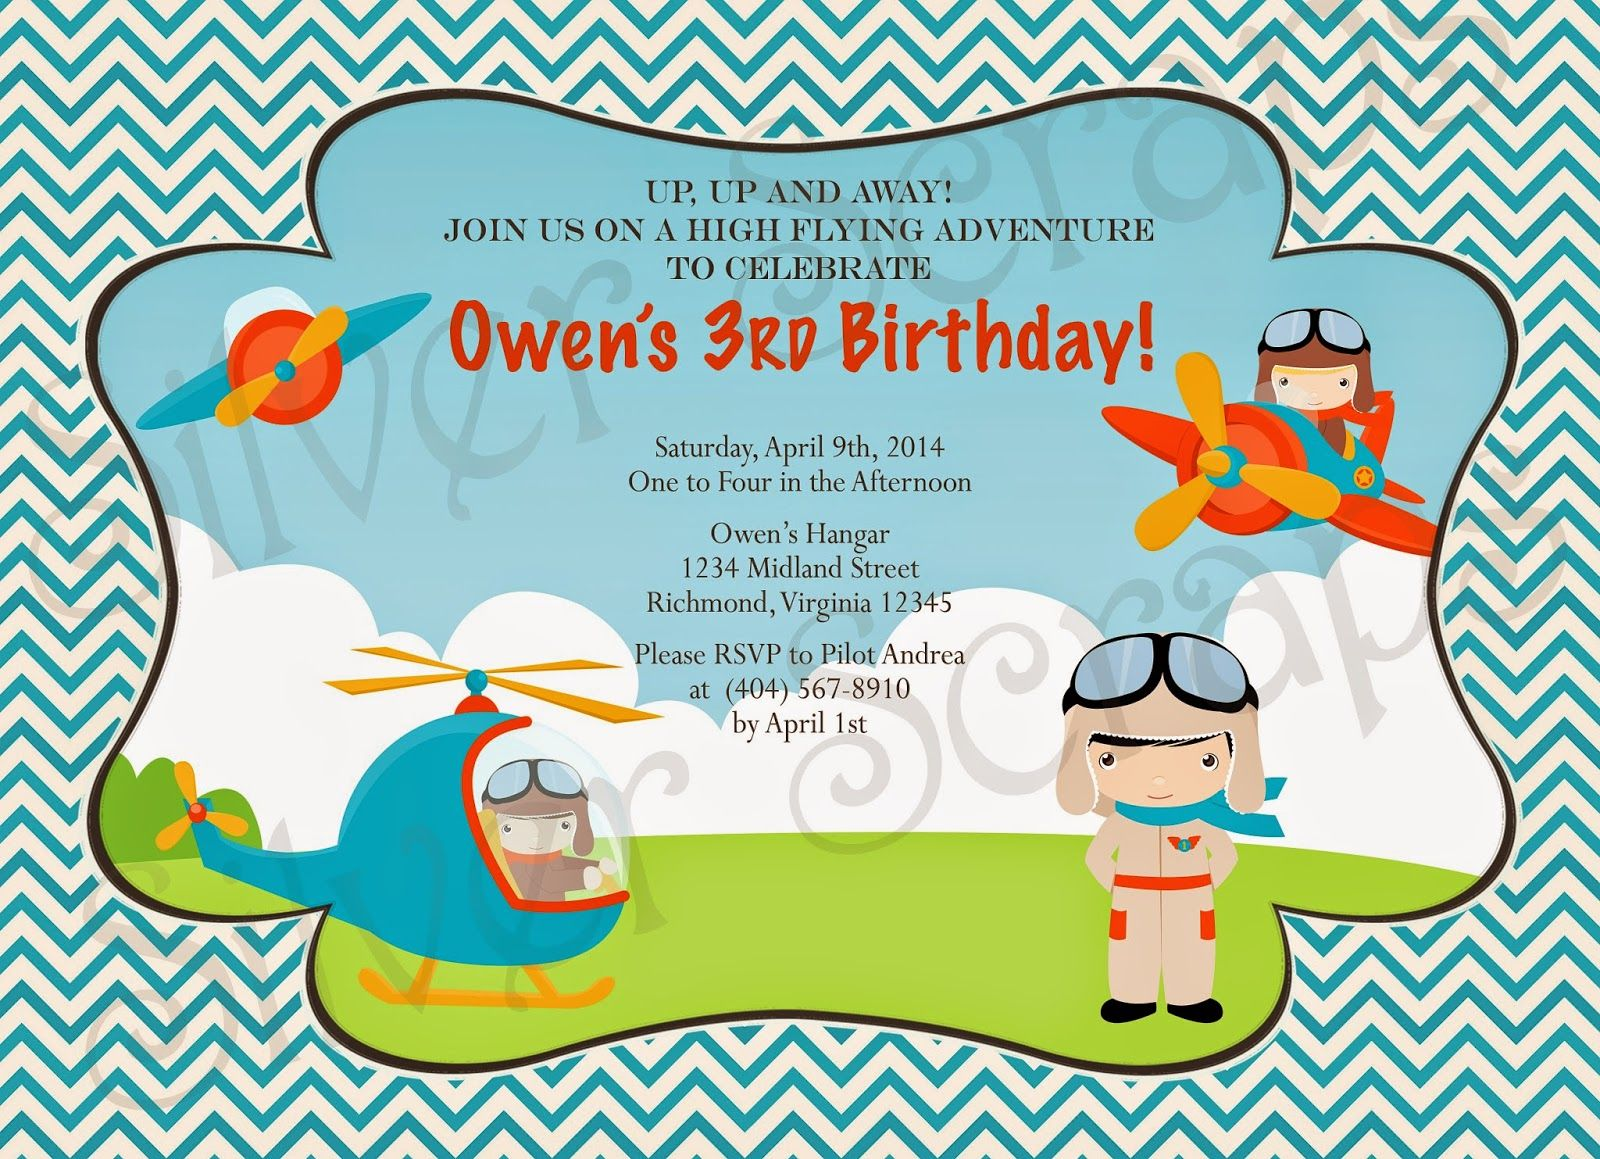 Up, Up, and Away - Custom Digital Airplane Birthday Invitation ...